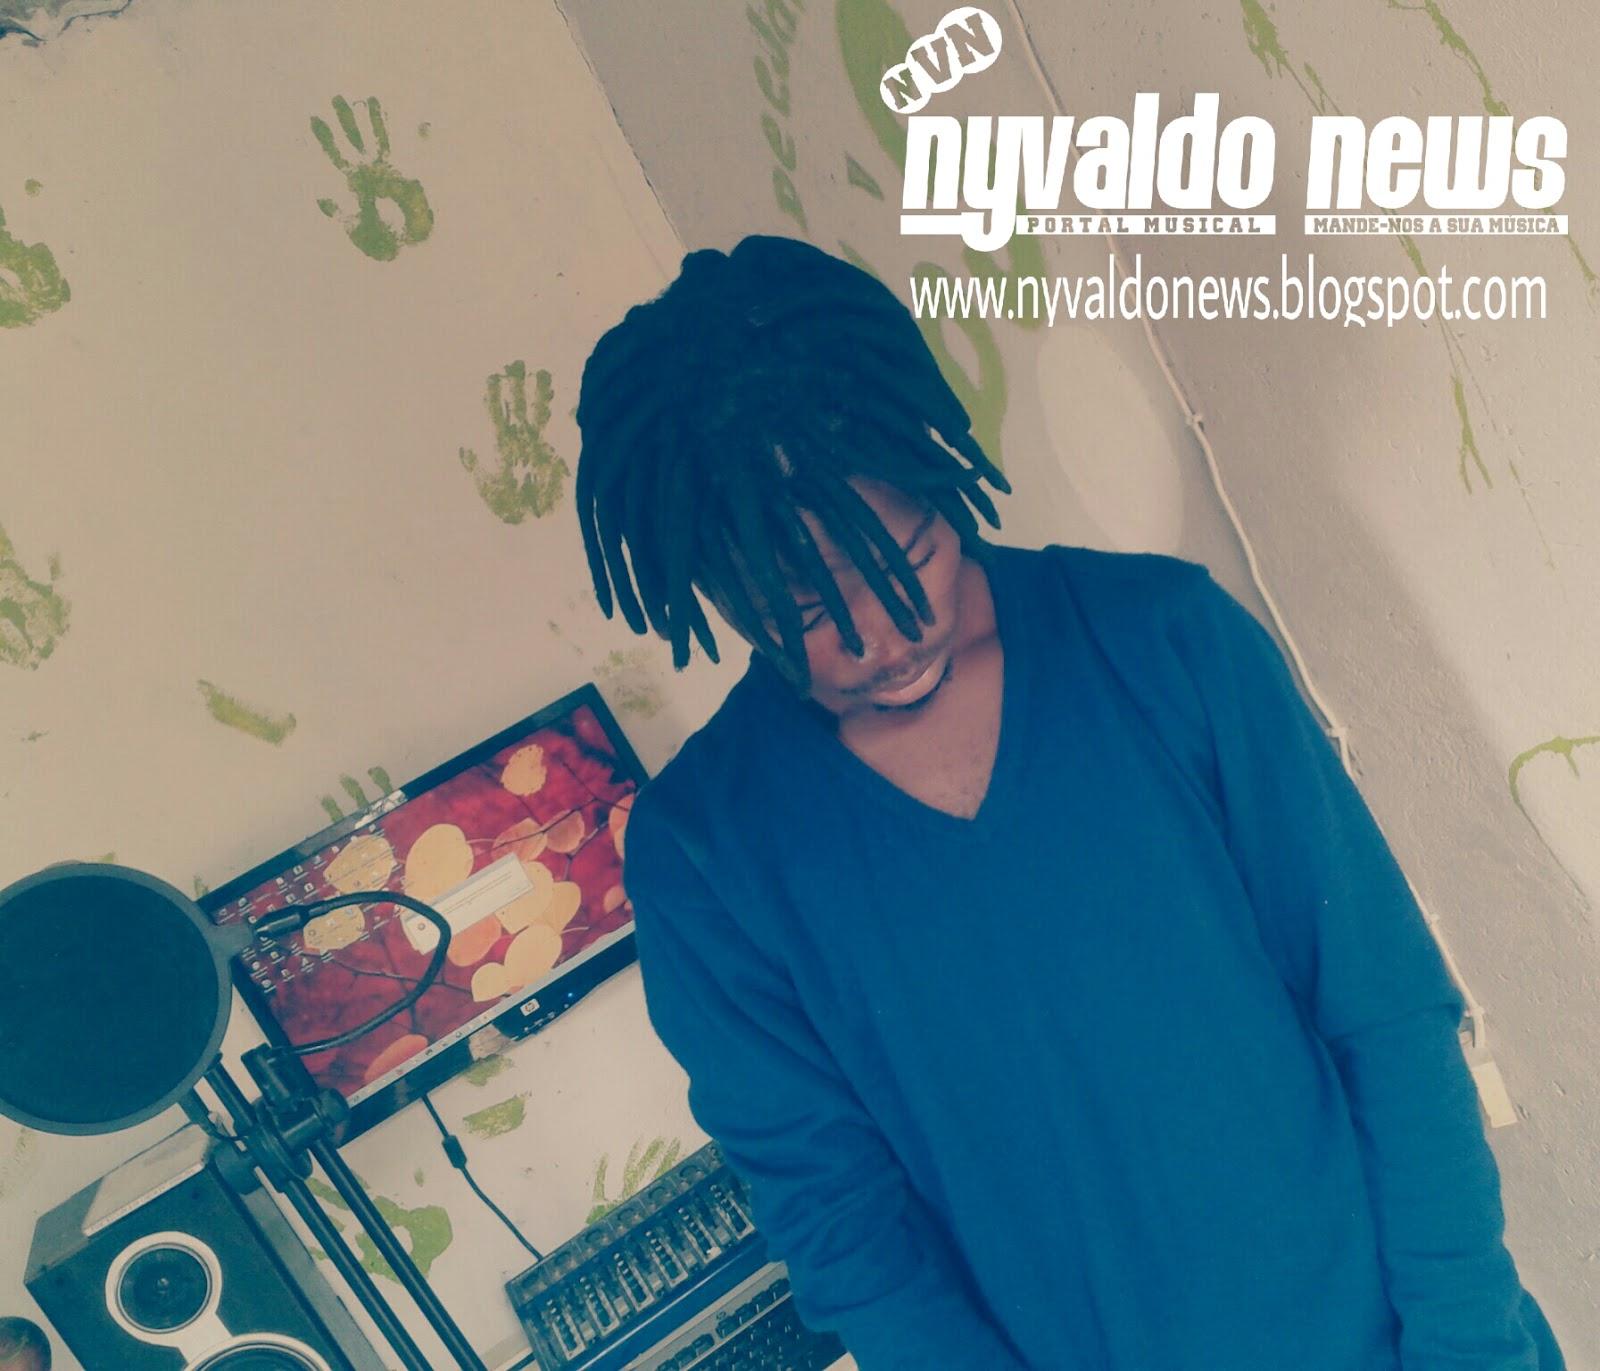 Khalid Young Dum Mp3: Dji Wise Thb - Ngassakidila (R&B) [Download]